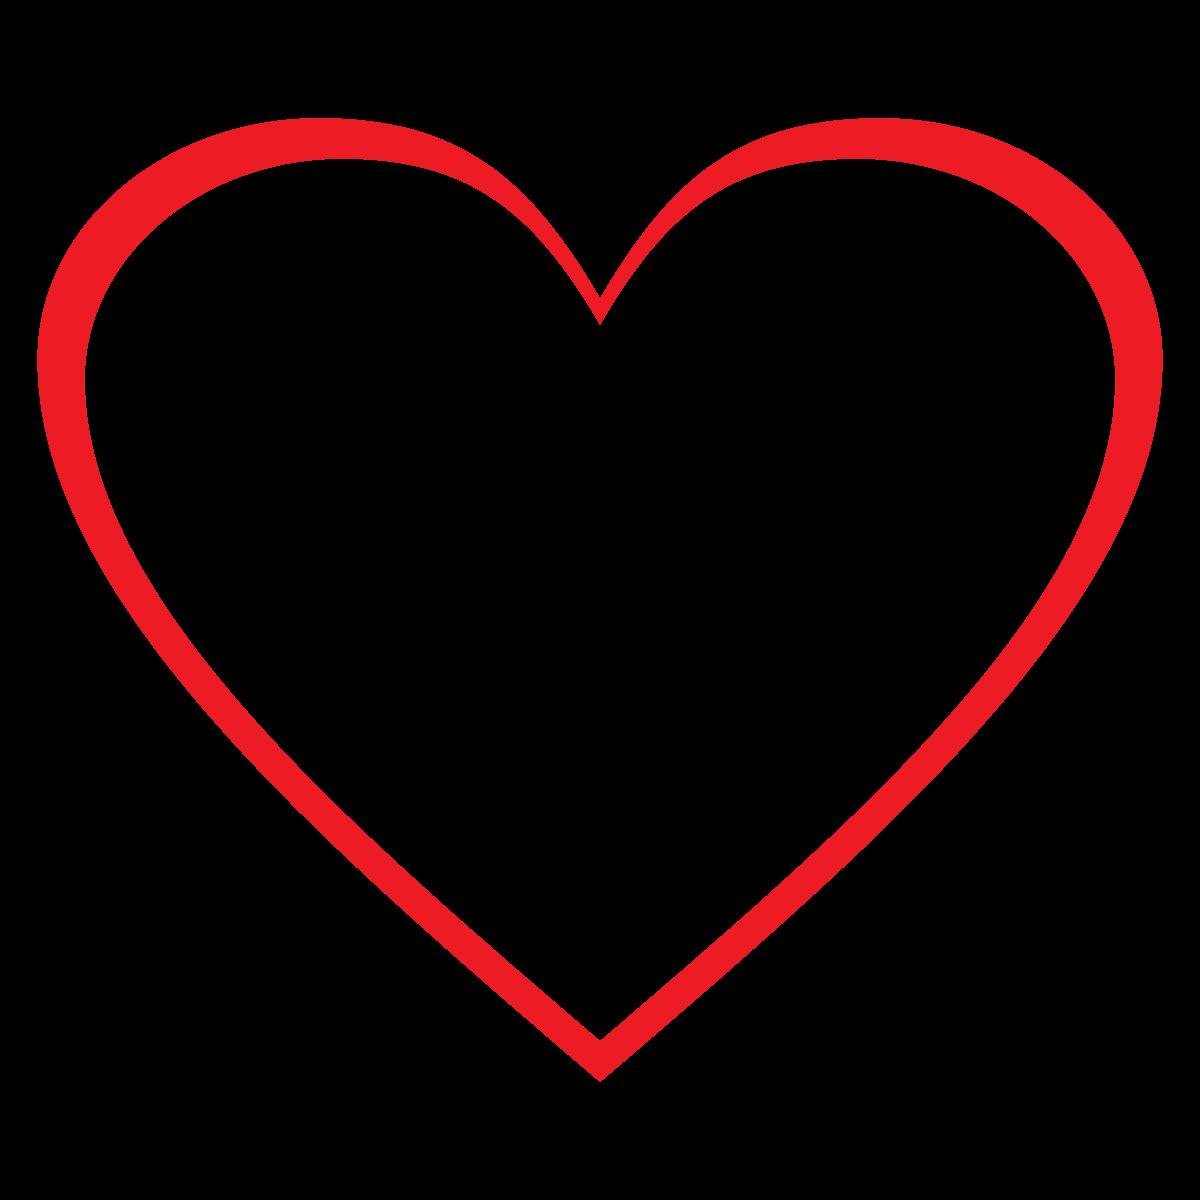 Heart clipart free clip art of hearts clipart clipart 2 clipartix